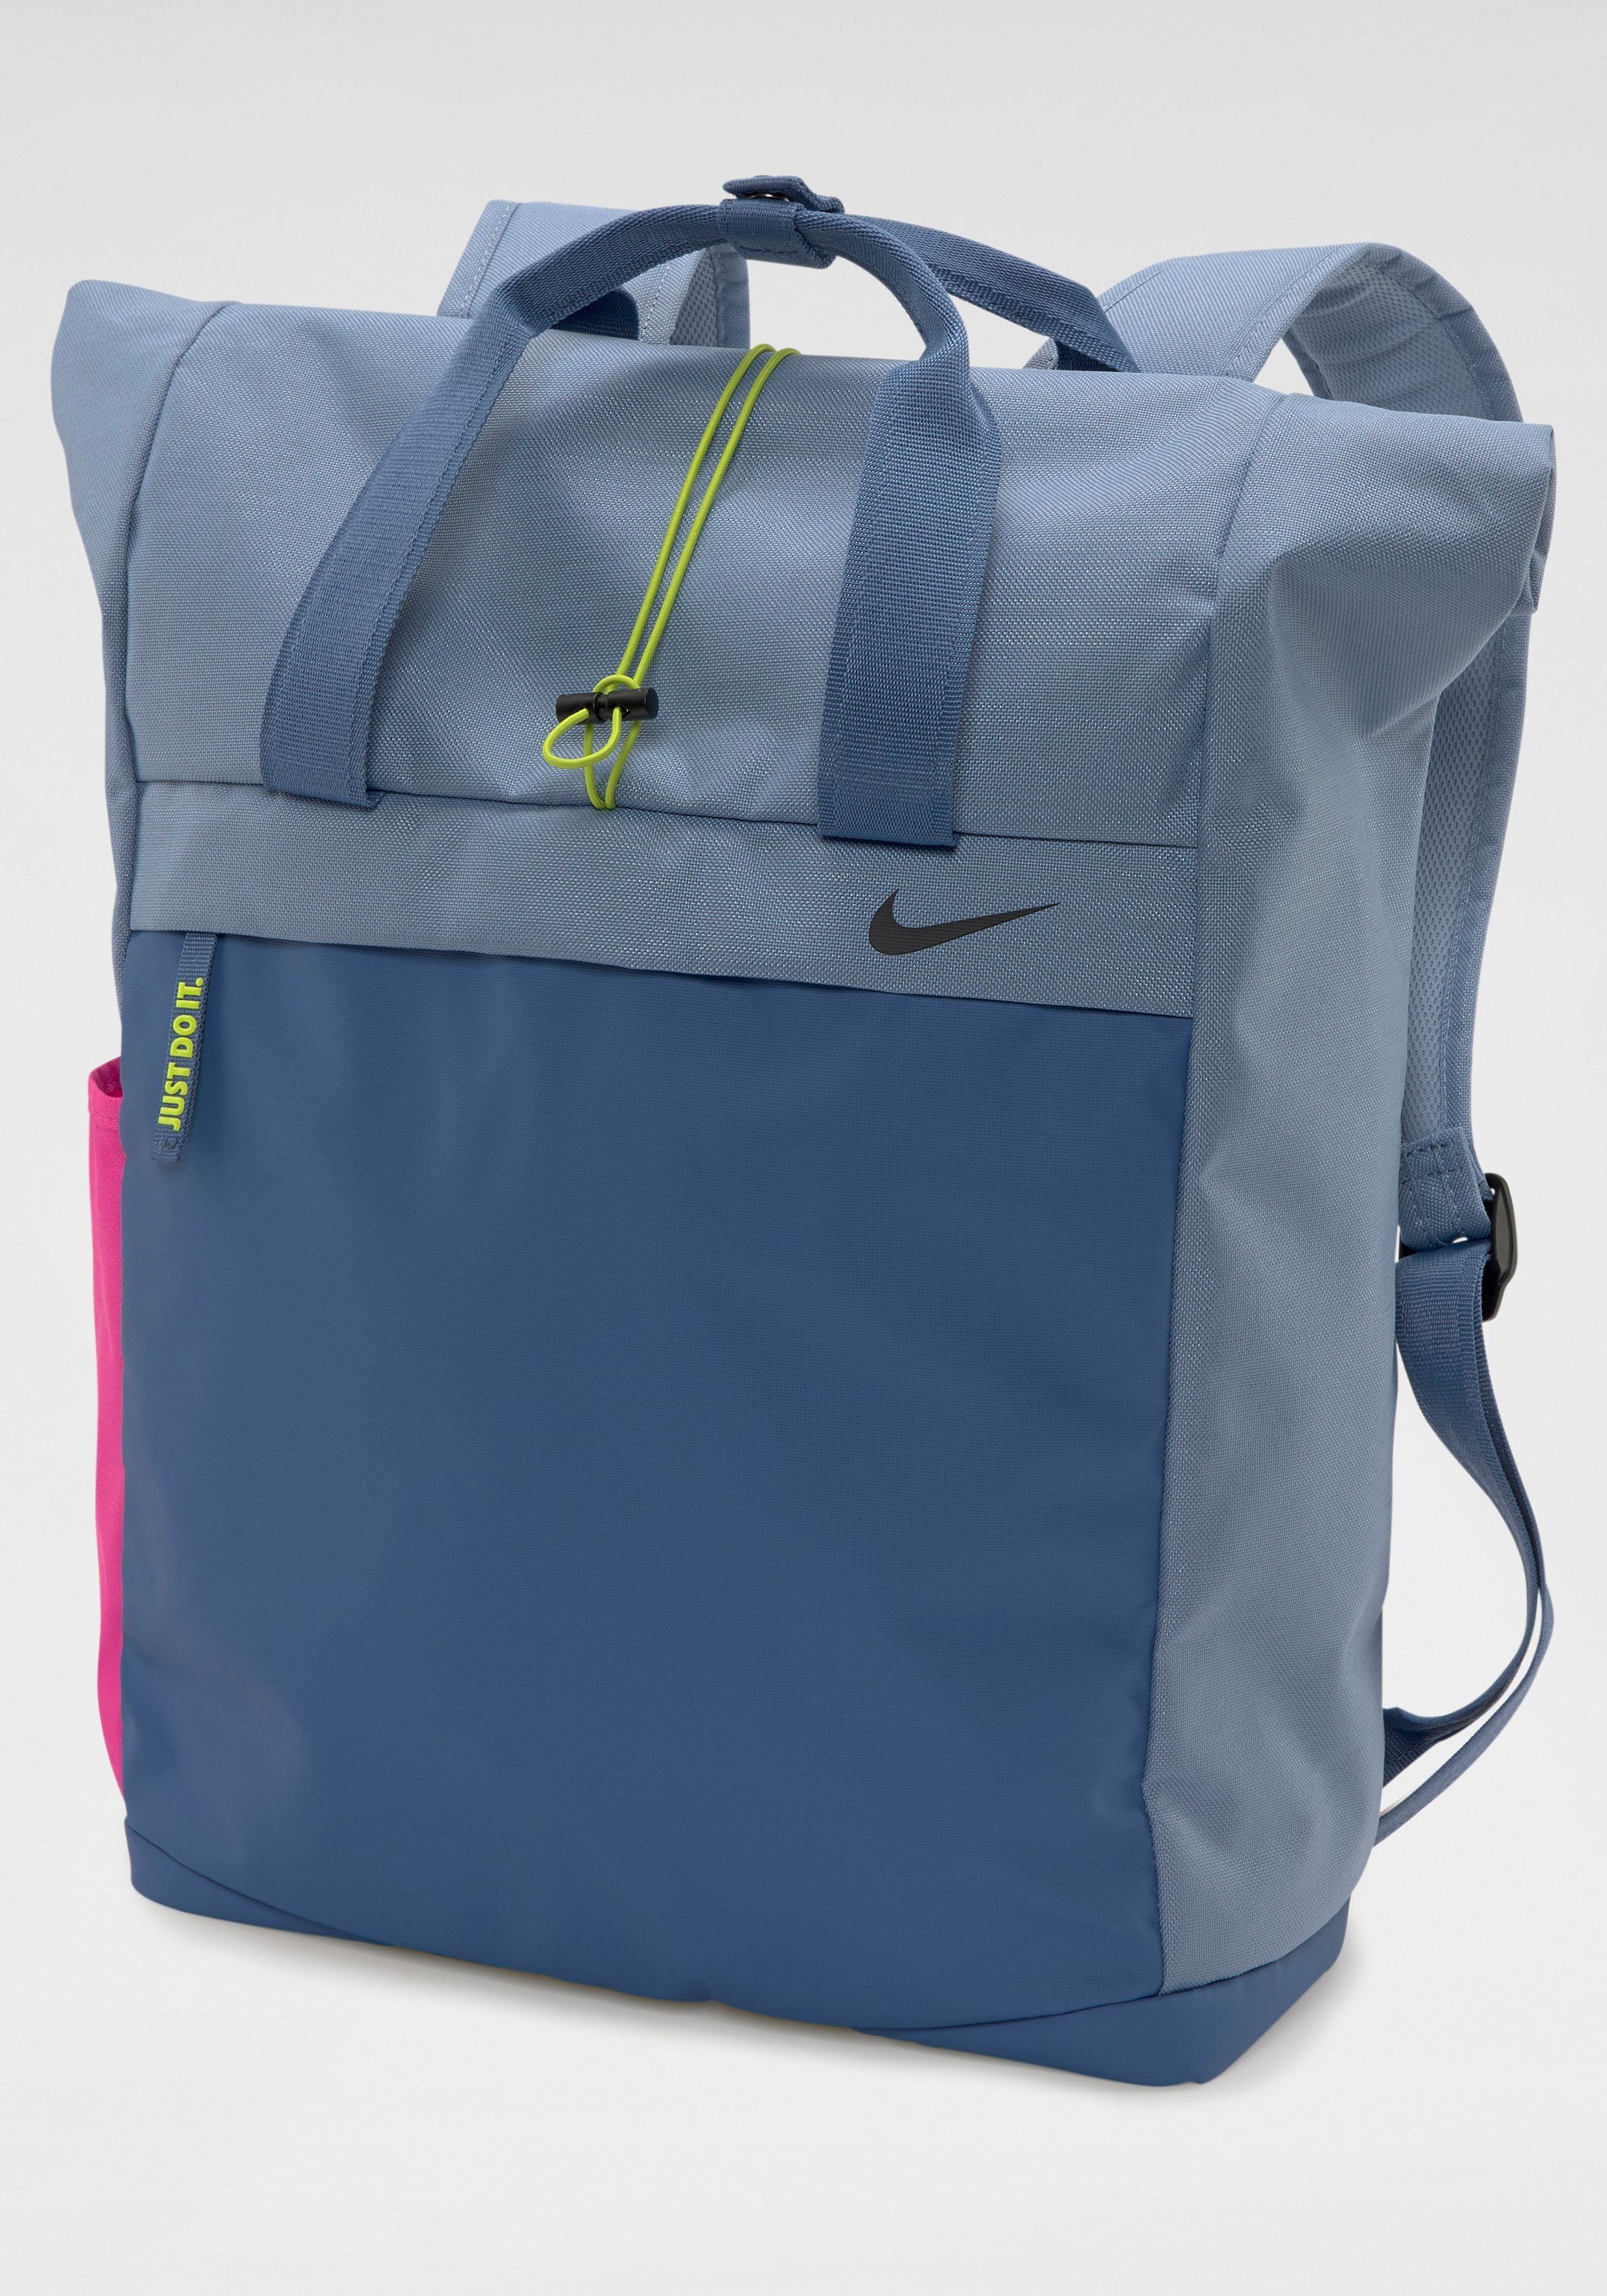 Nike Sportrucksack »NIKE RADIATE TRAININGSRUCKSACK« online kaufen   OTTO